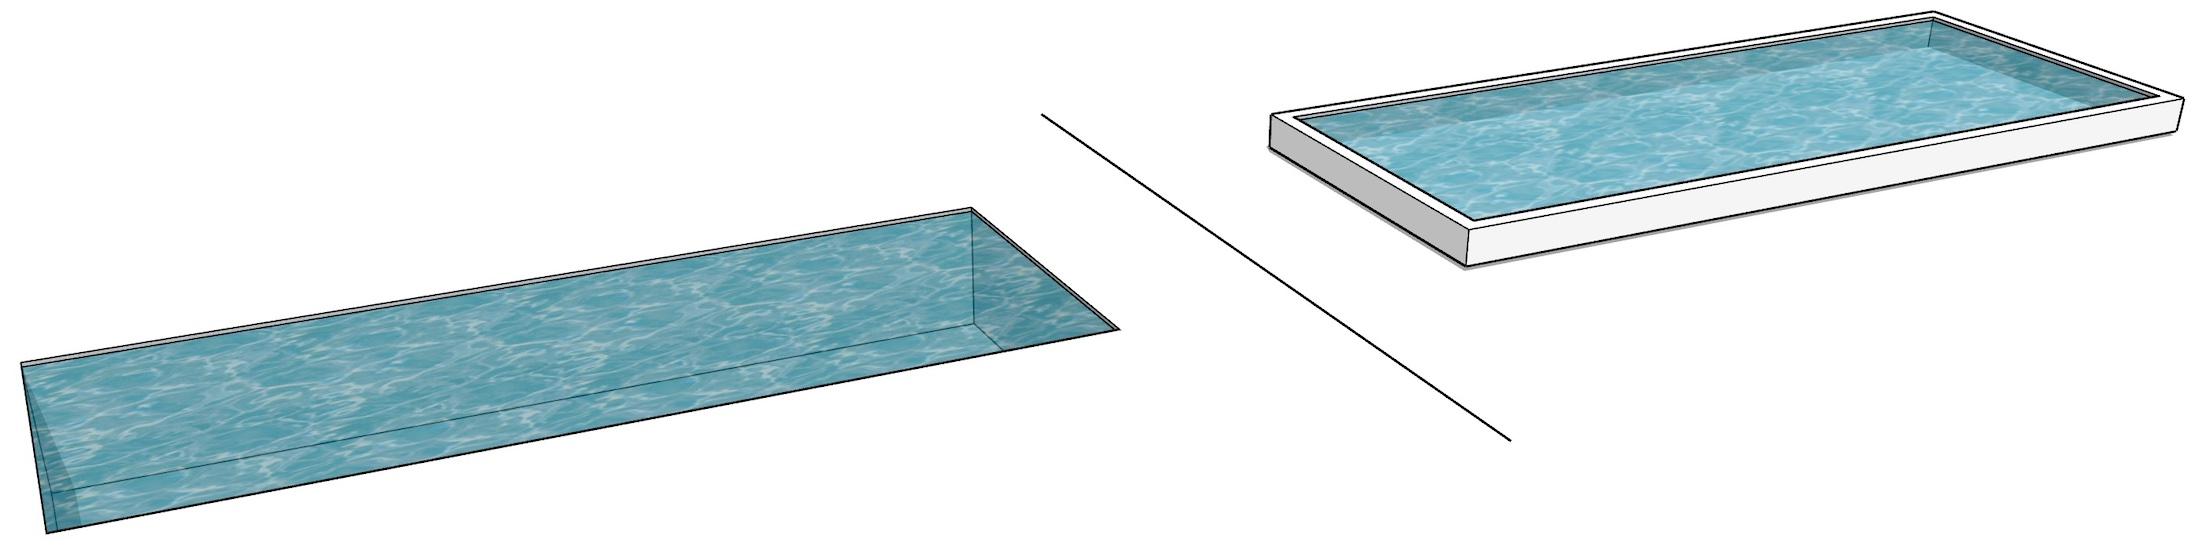 piscine enterrée versus piscine semi hors-sol